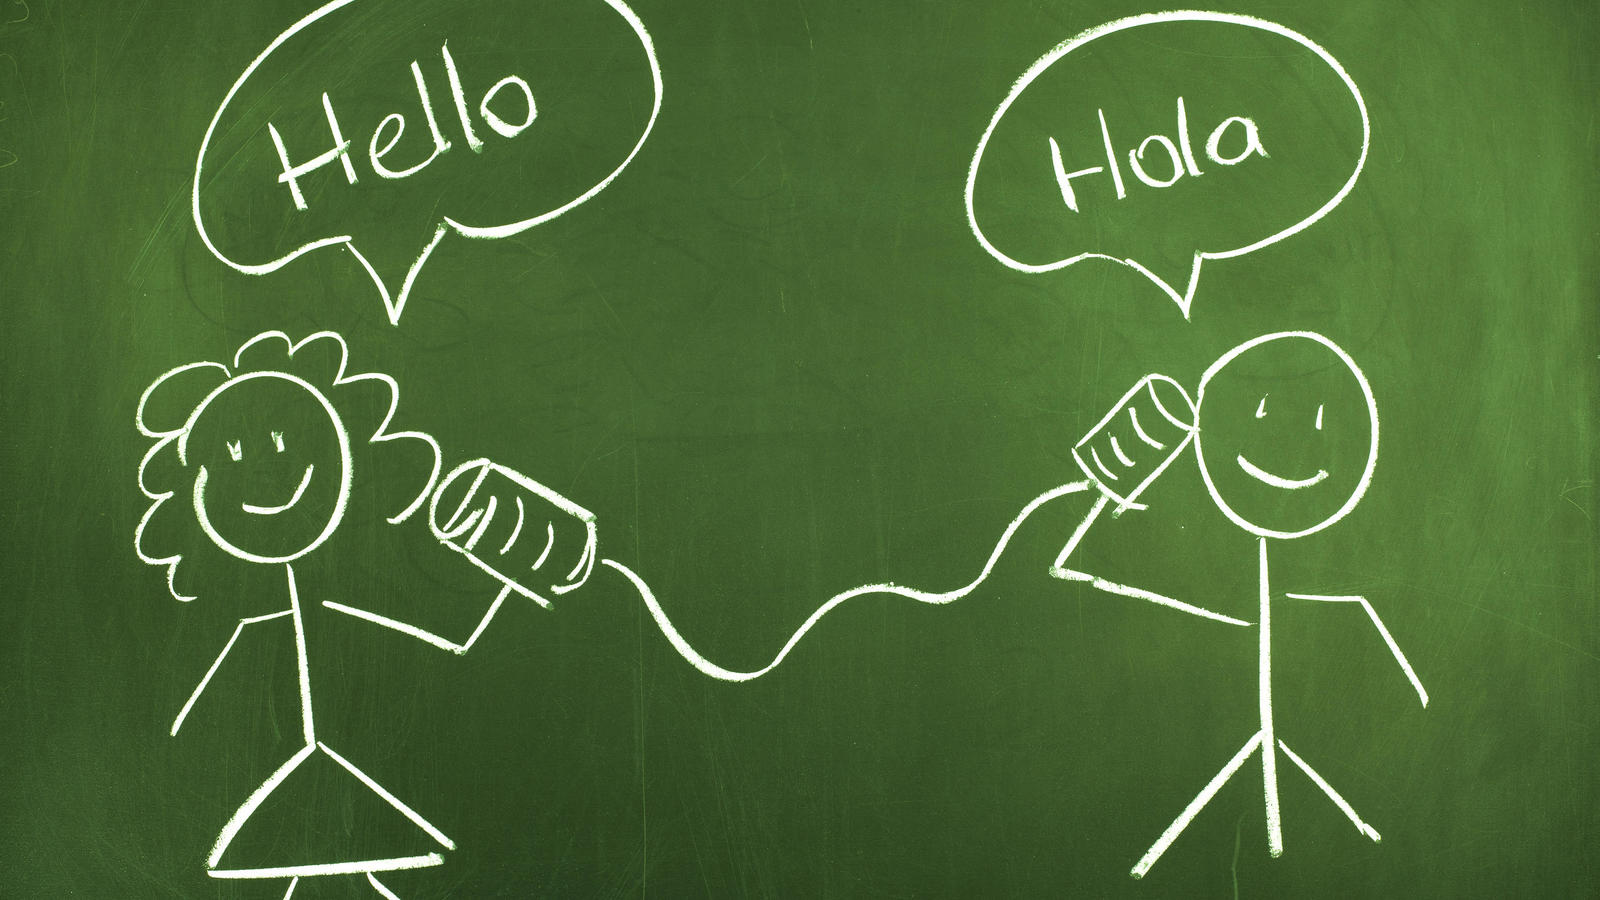 bilingüismo en la educacion infantil